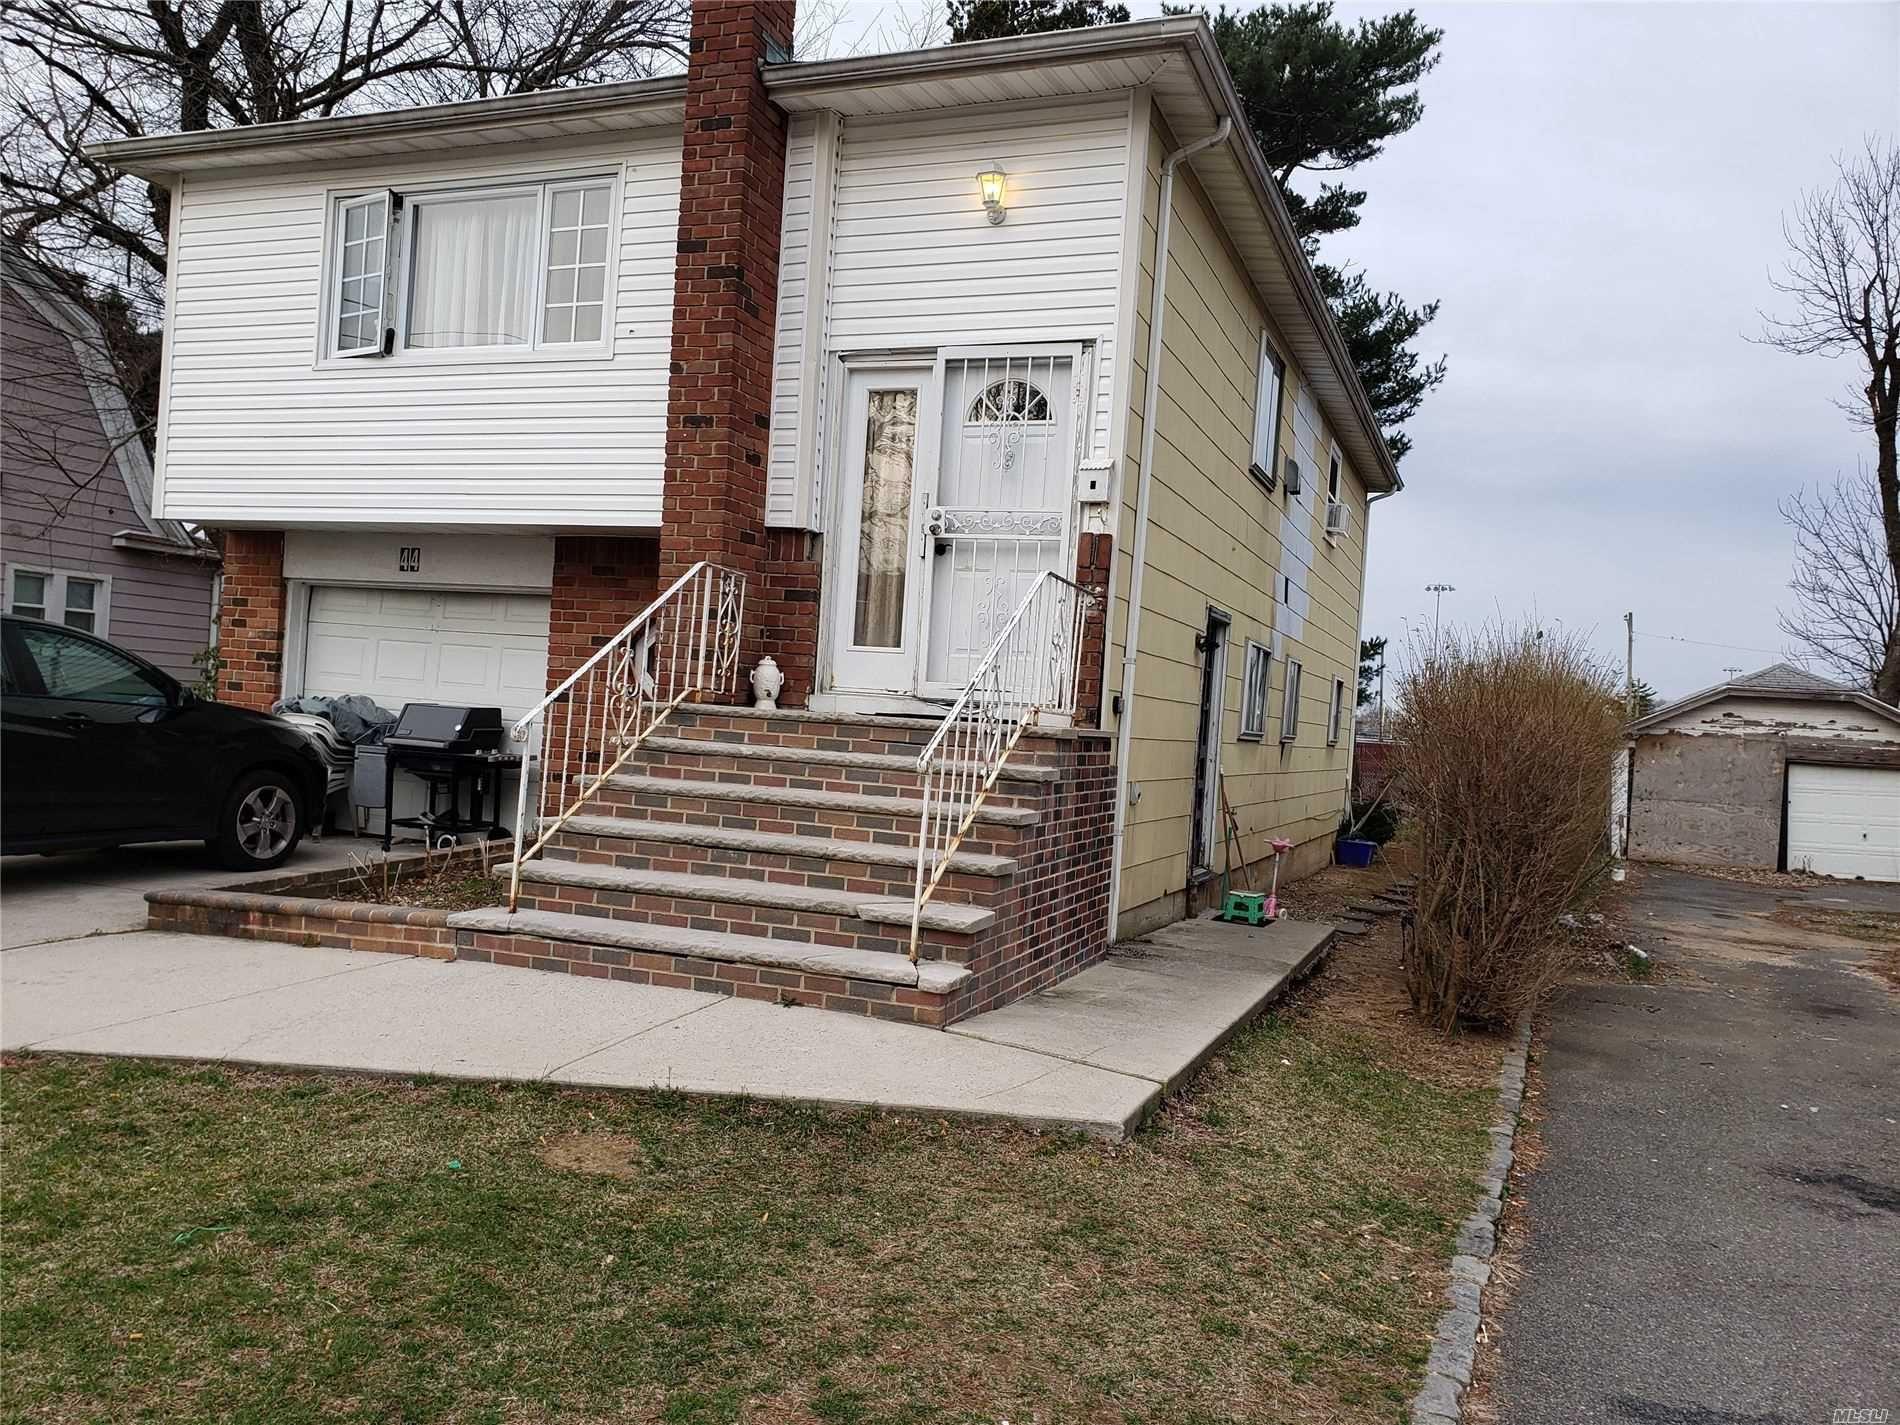 44 Ingraham Street, Hempstead, NY 11550 - MLS#: 3184125